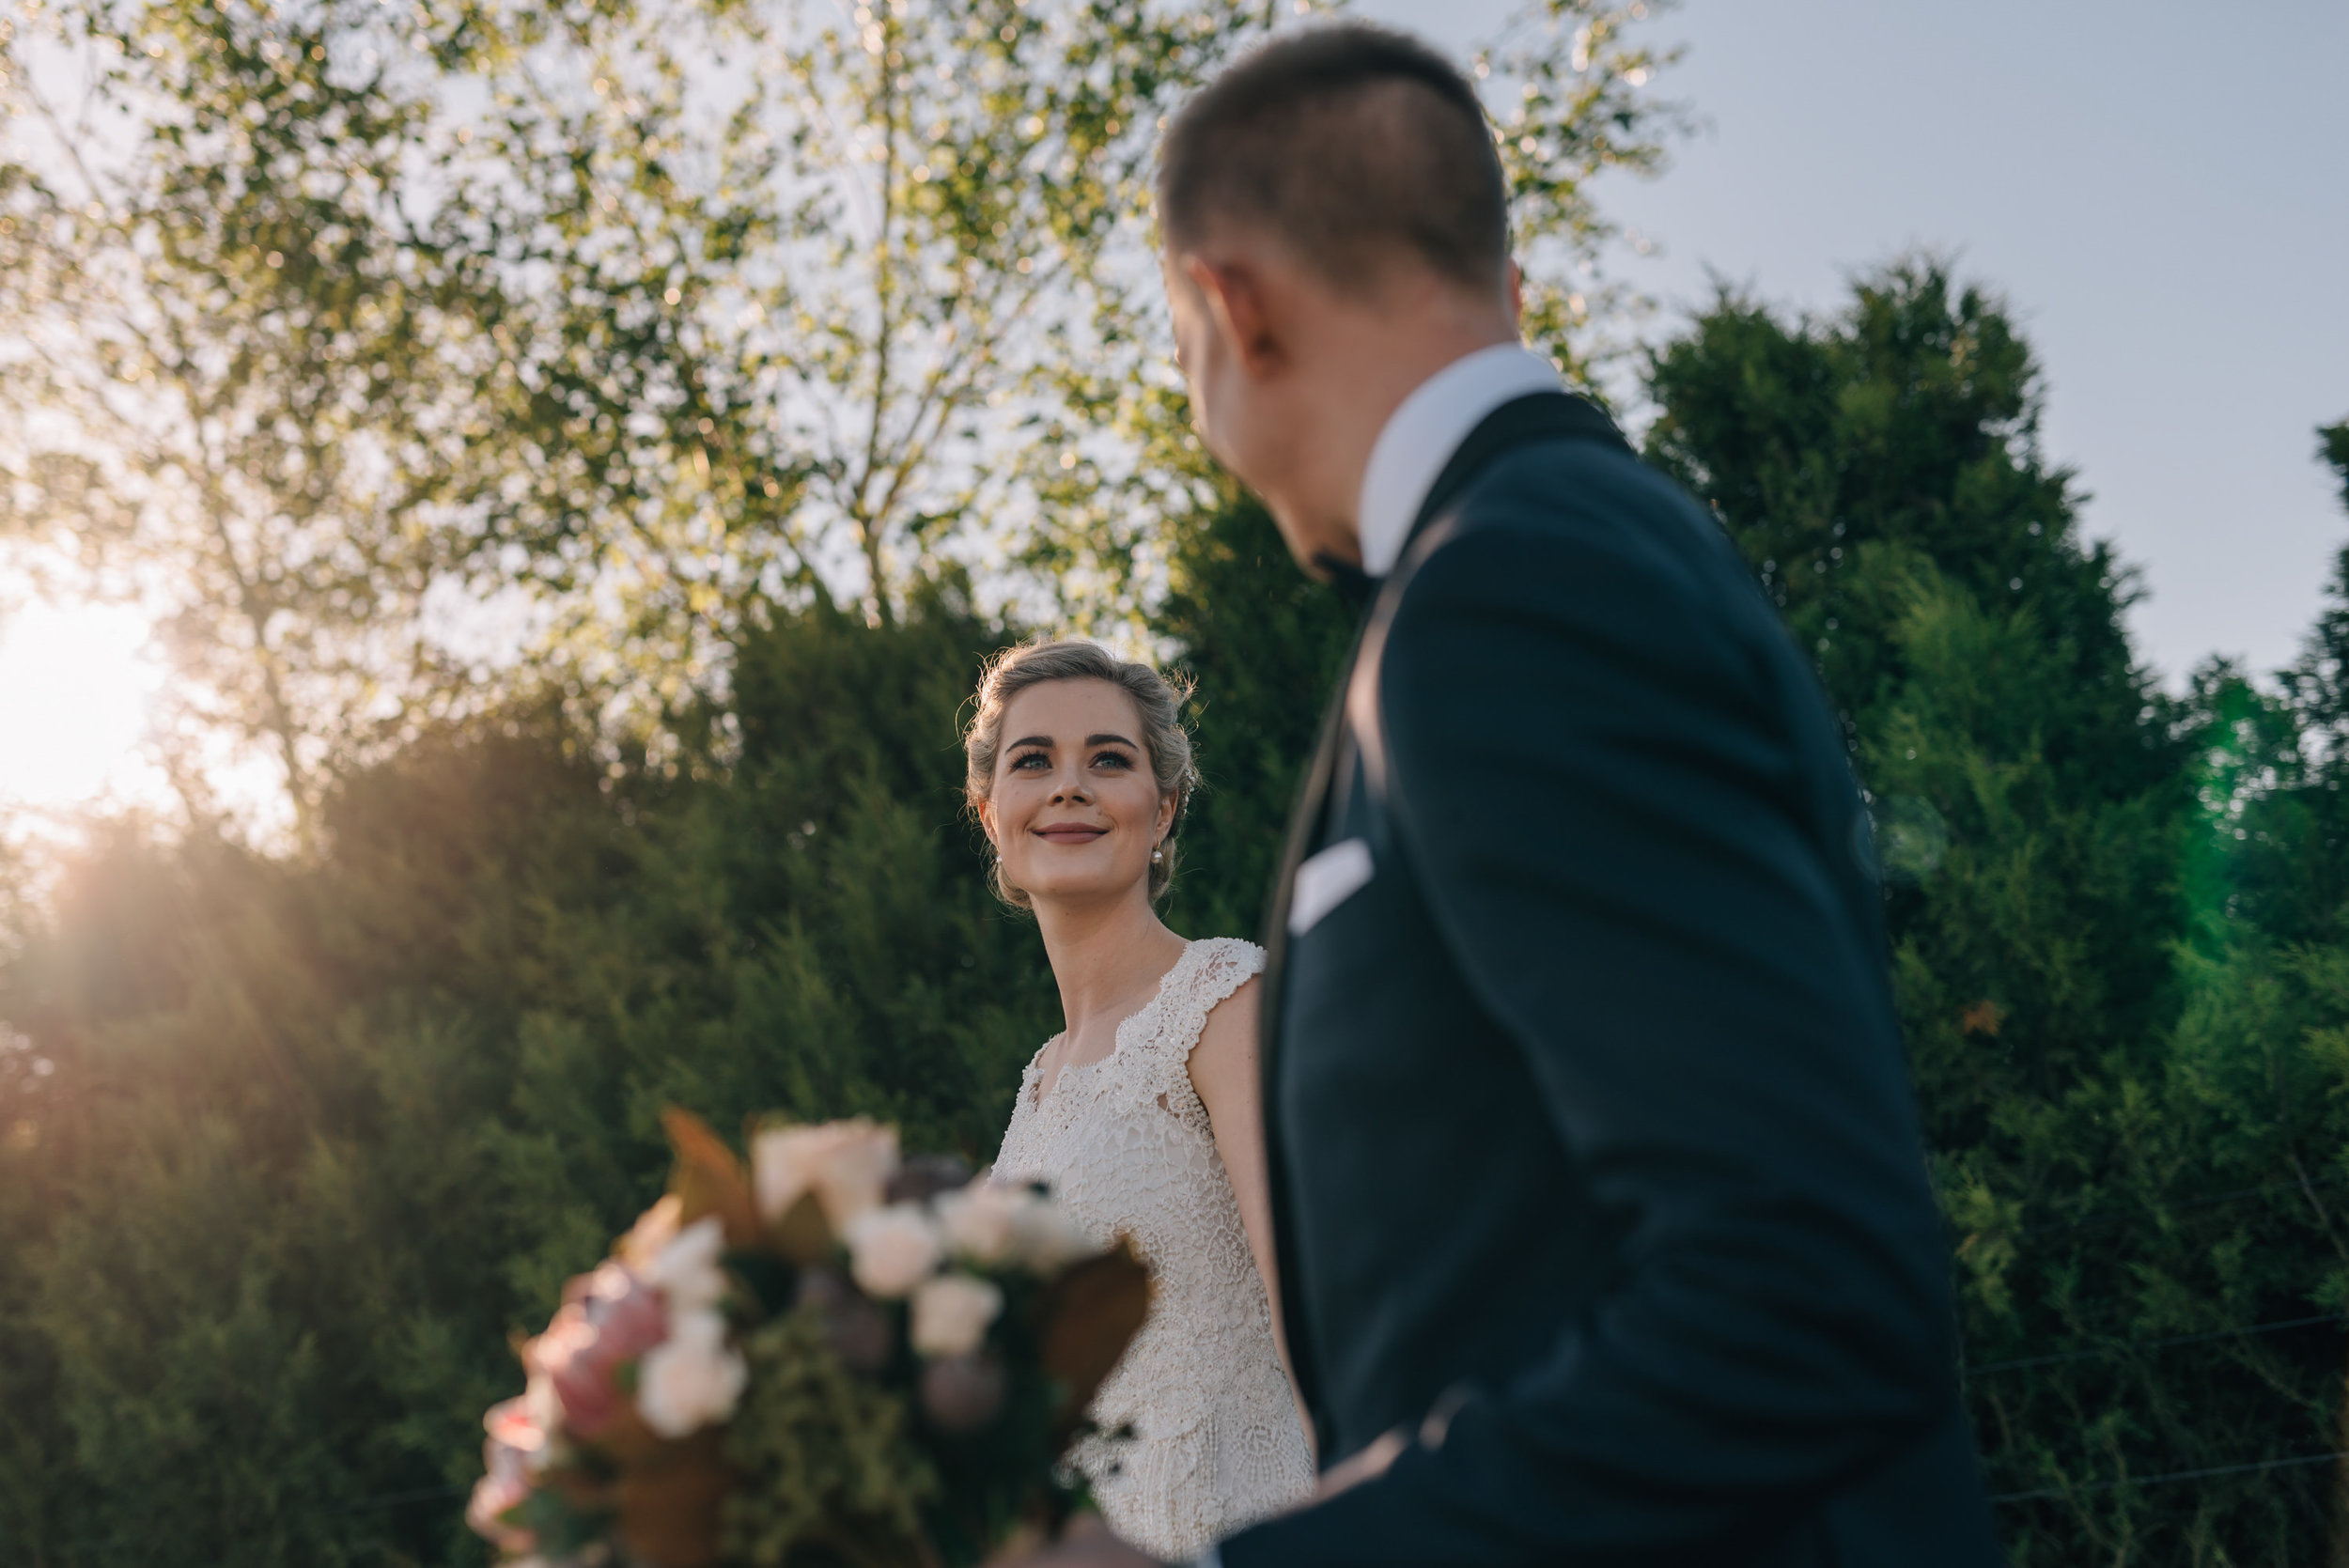 Josef-Chromy-Wedding-80.jpg